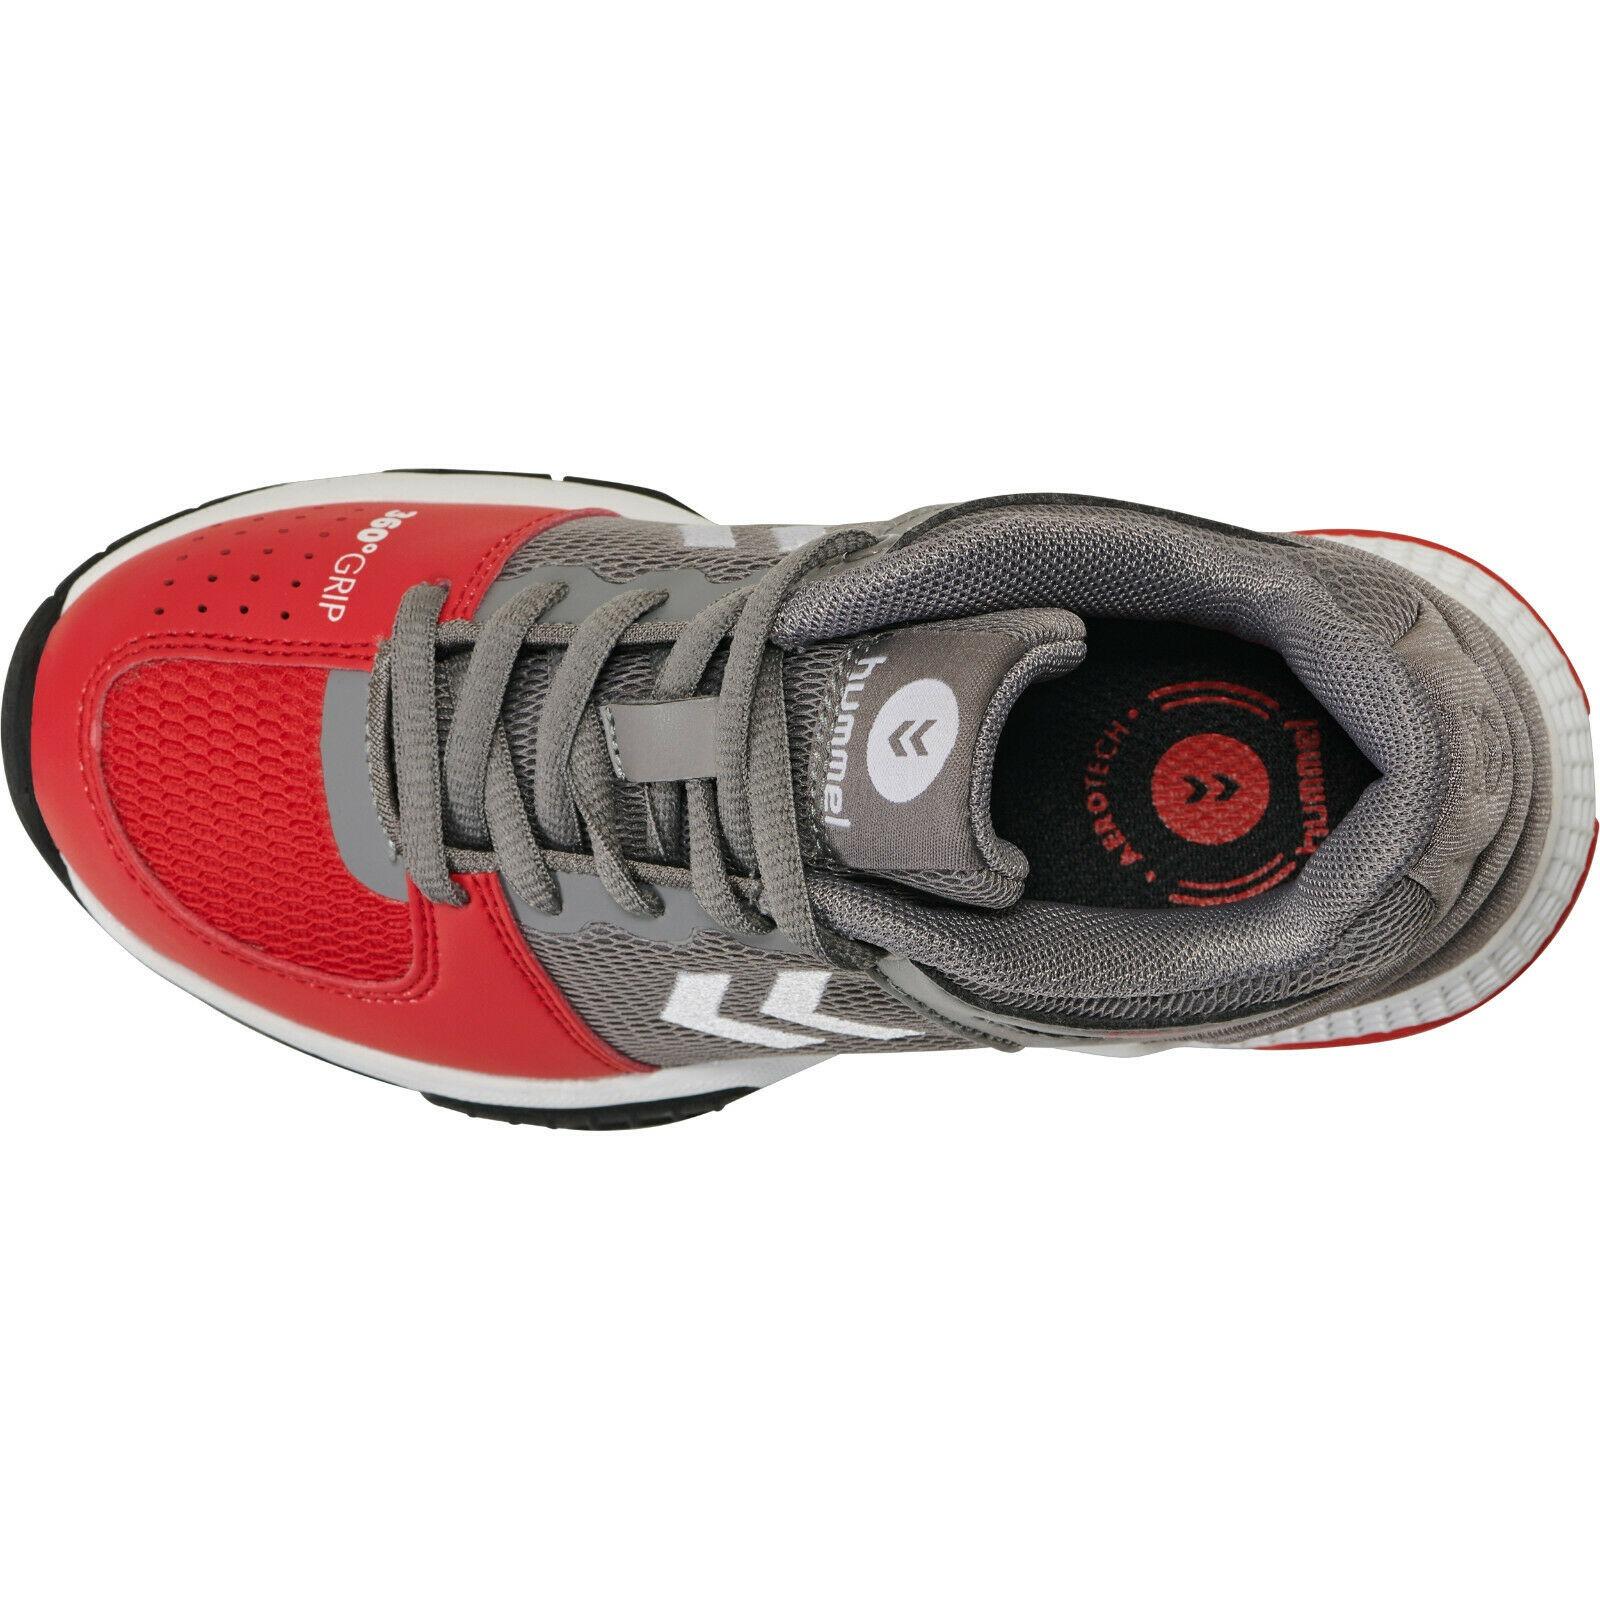 Спортивная обувь Hummel Лето (1308) photo 1